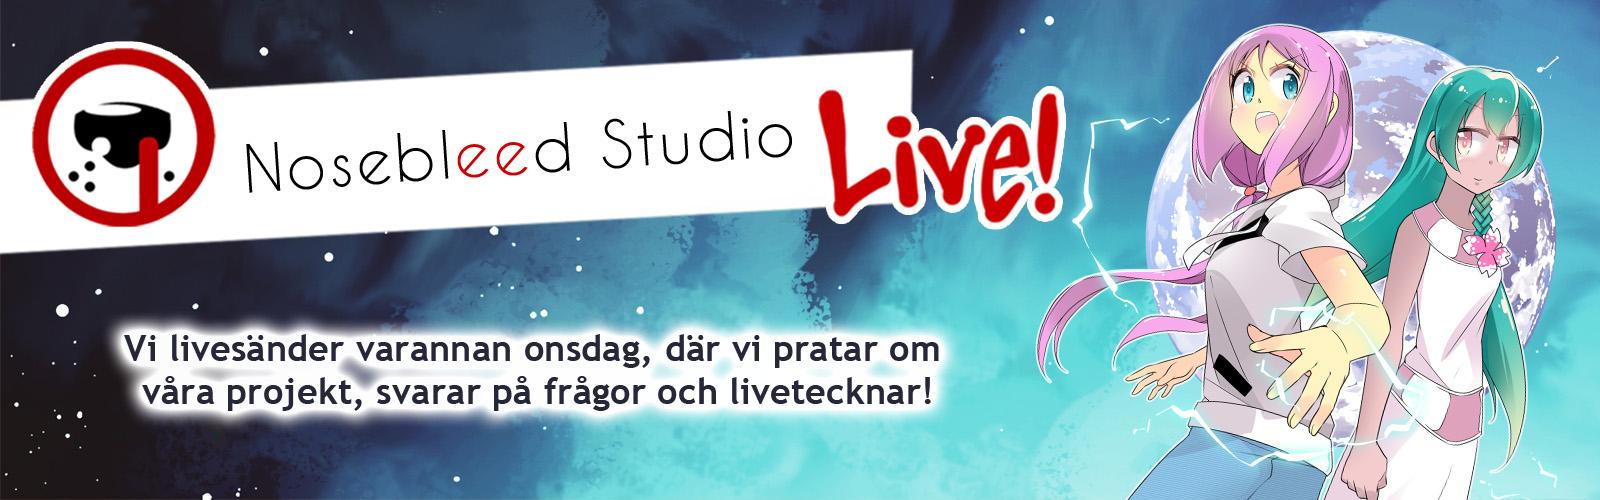 Nosebleed Studio Live!